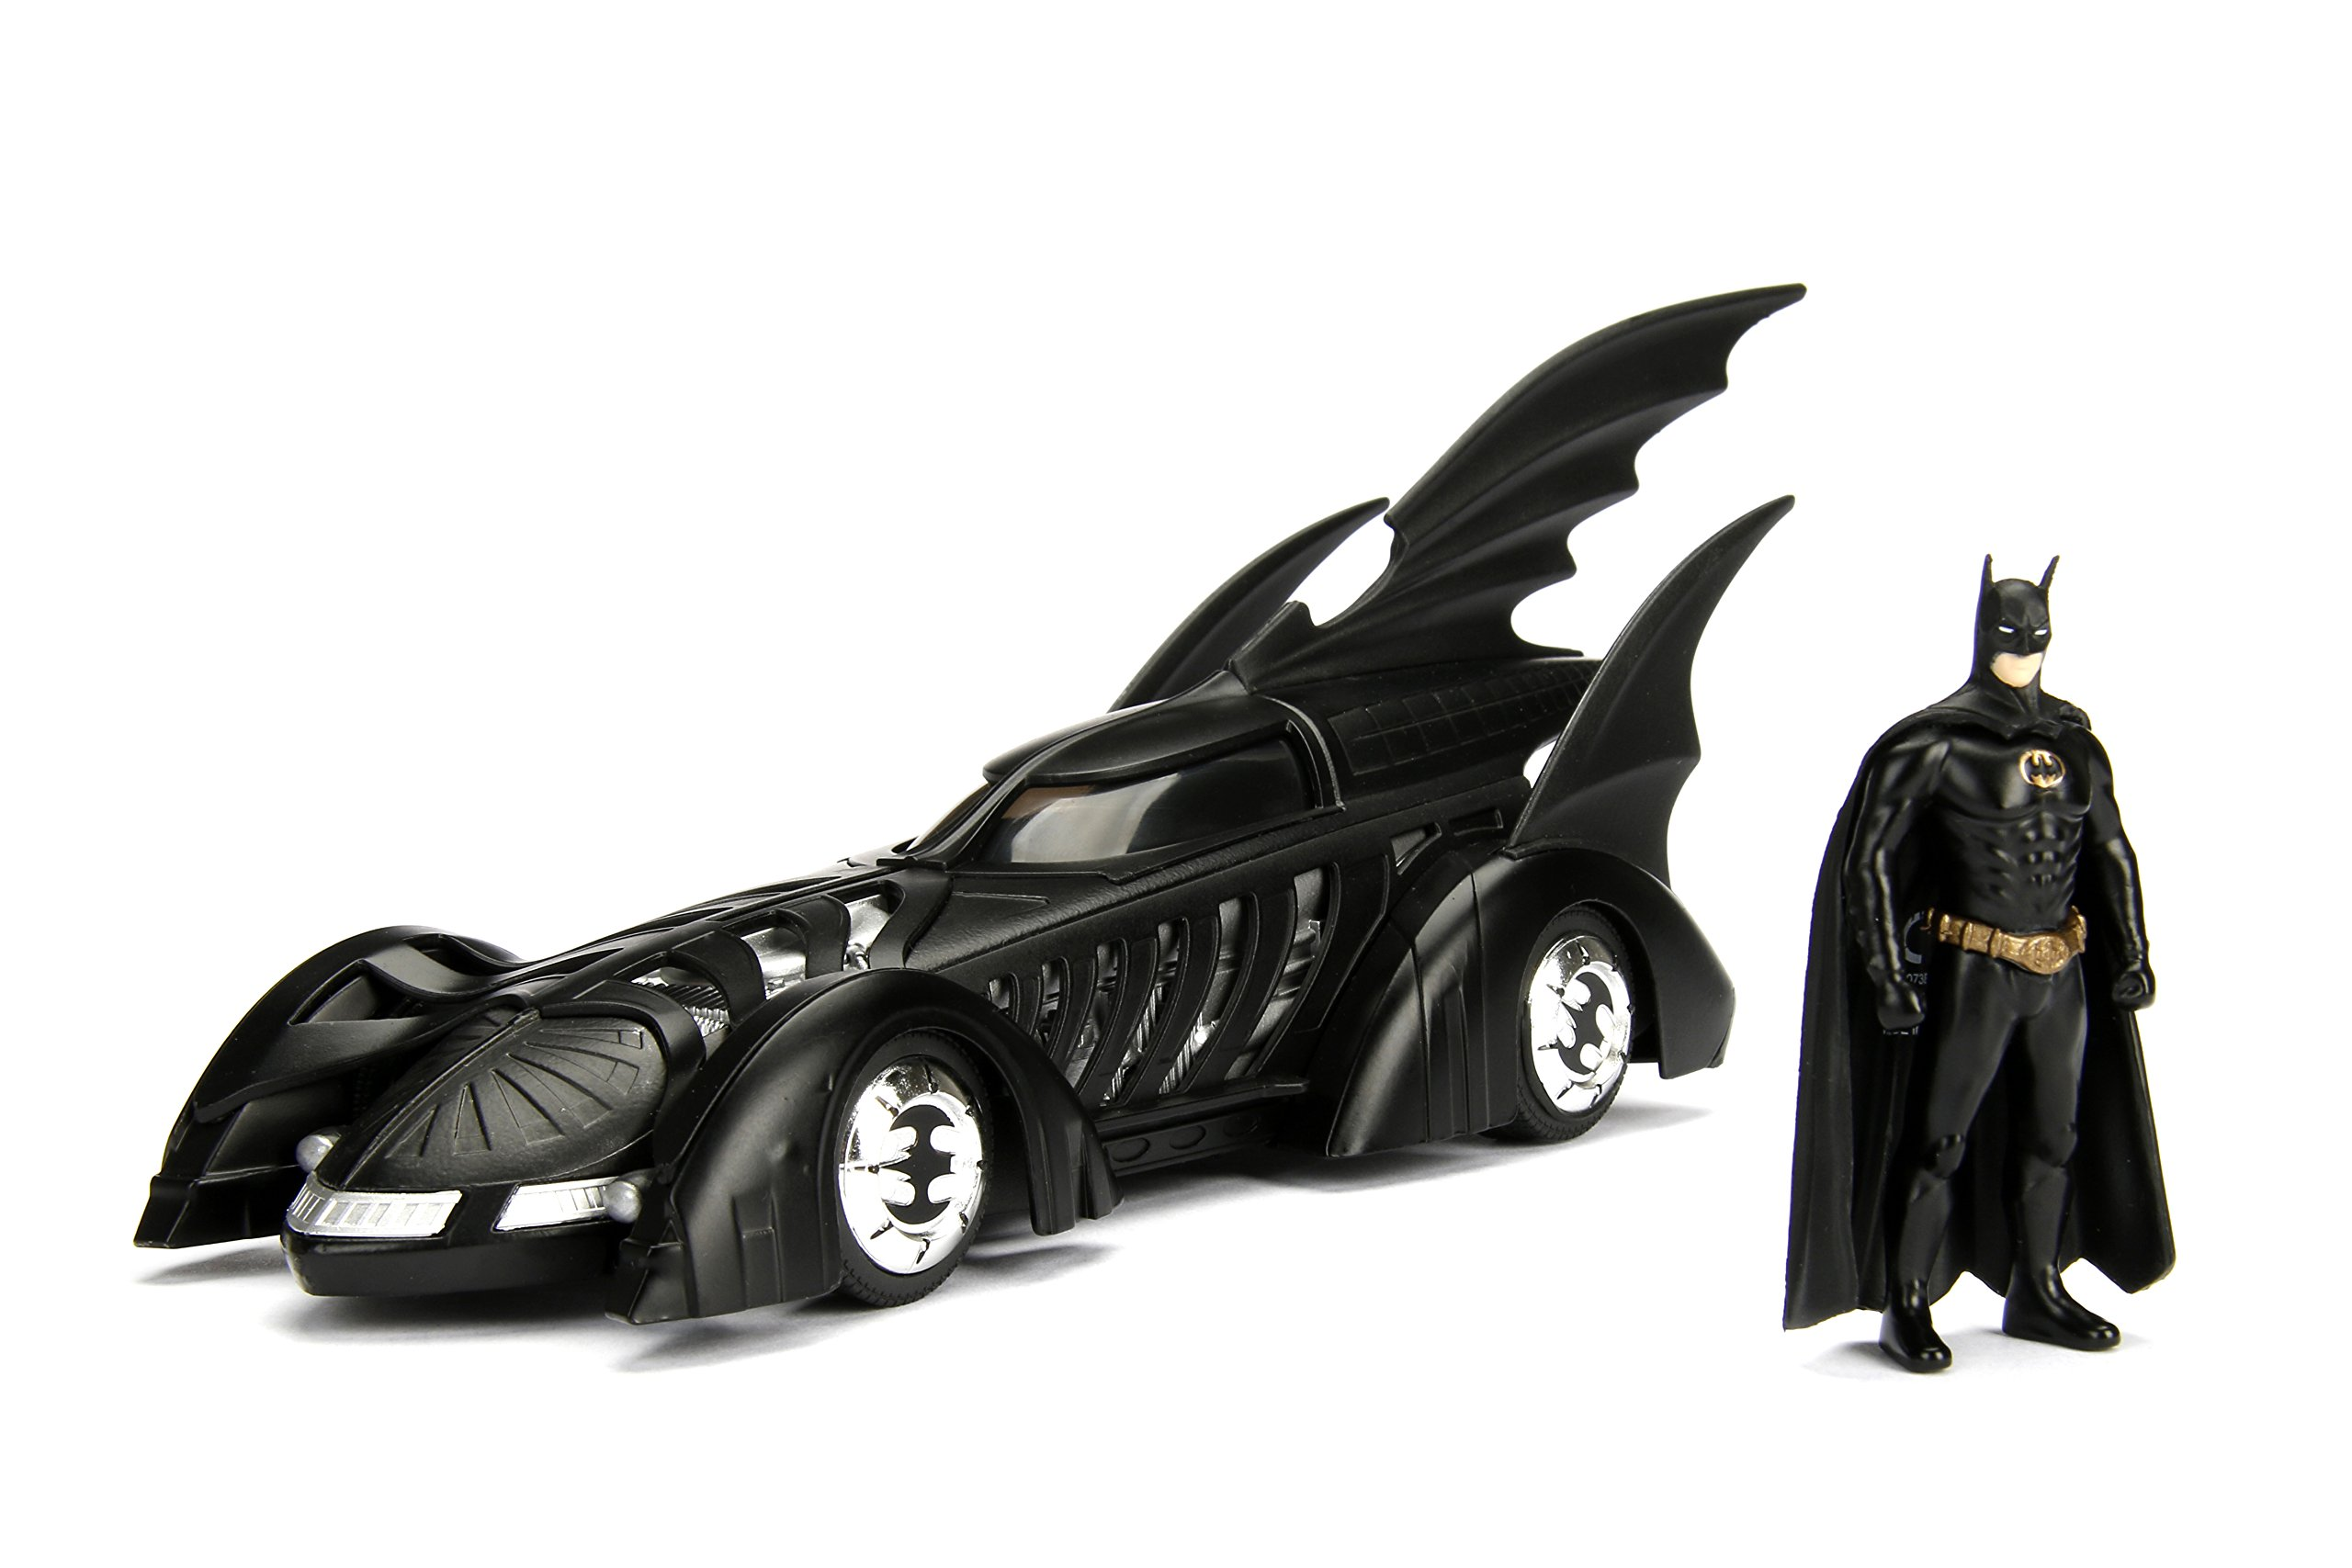 Jada Toys DC Comics Batman Forever Batmobile Die-cast Car, 1:24 Scale Vehicle & 2.75'' Collectible Metal Figurine, Black